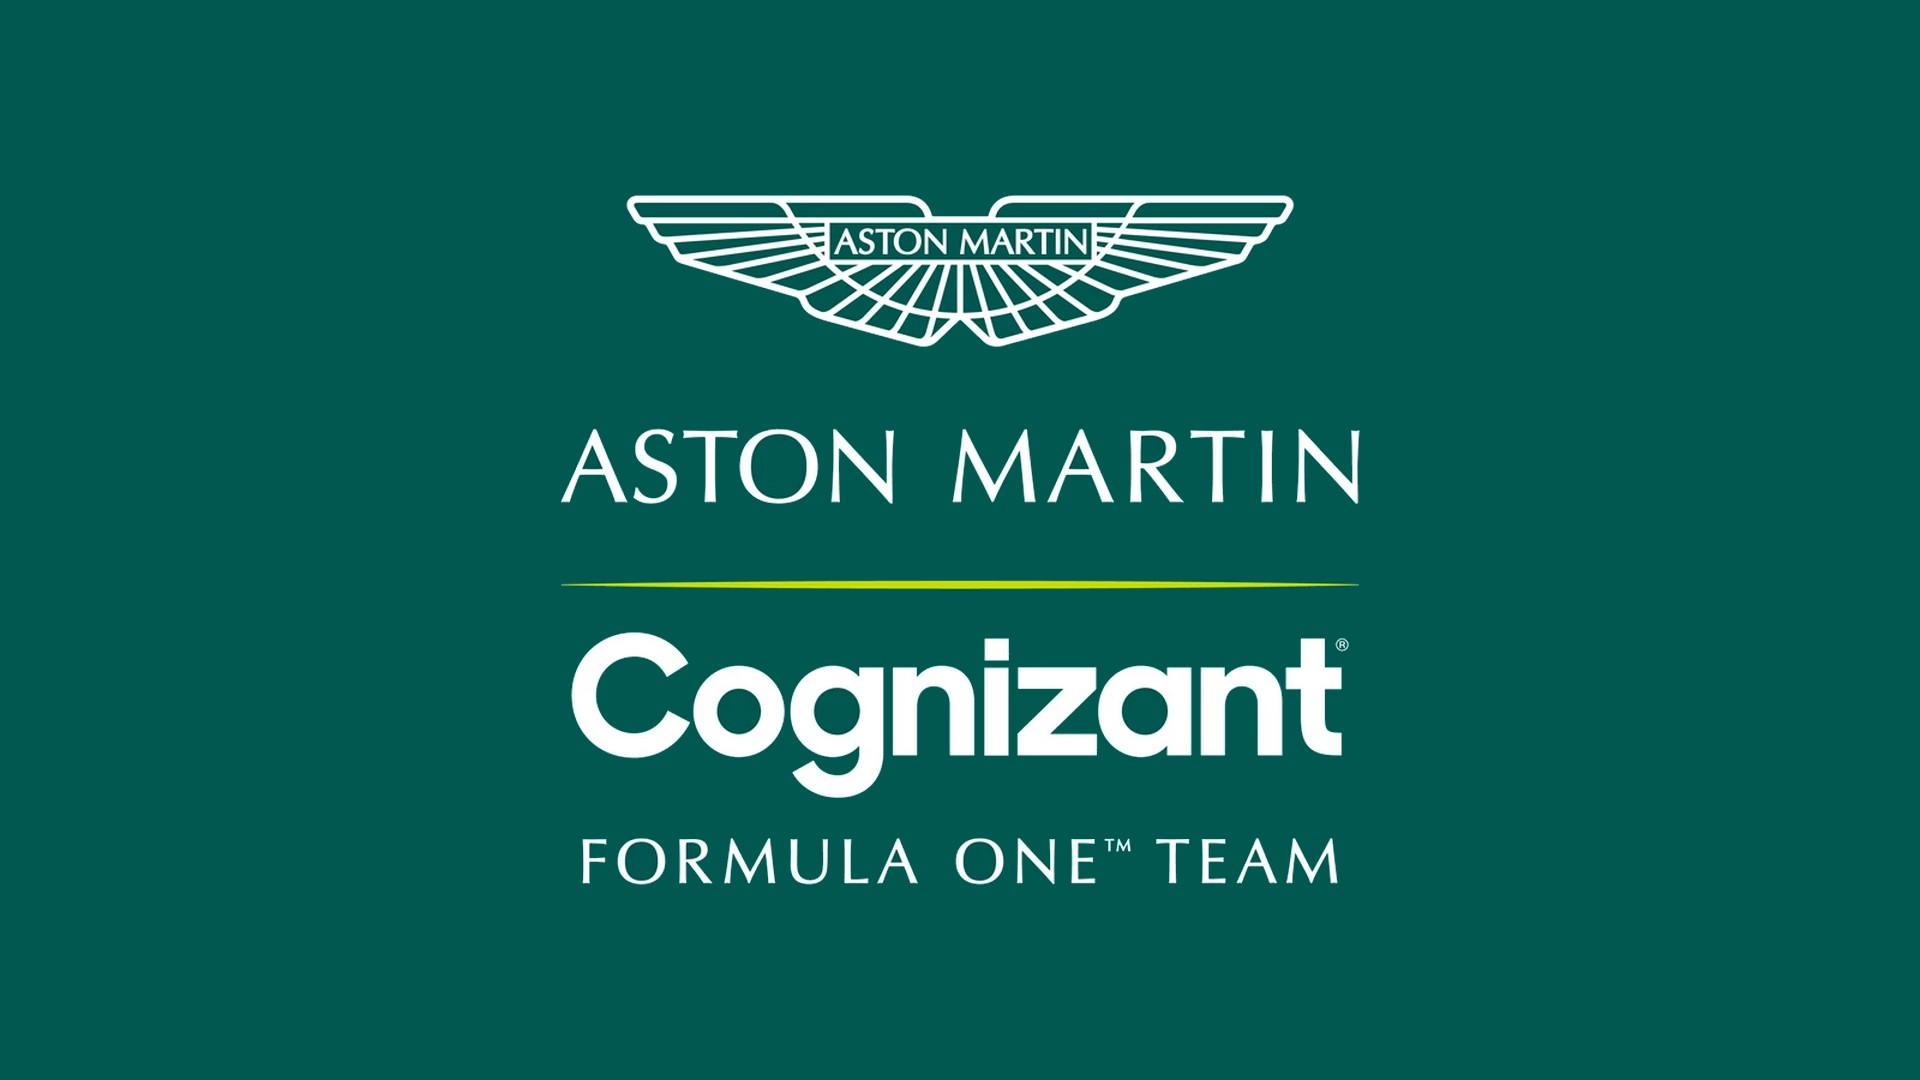 Aston Martin – Cognizant (1) F1 logo